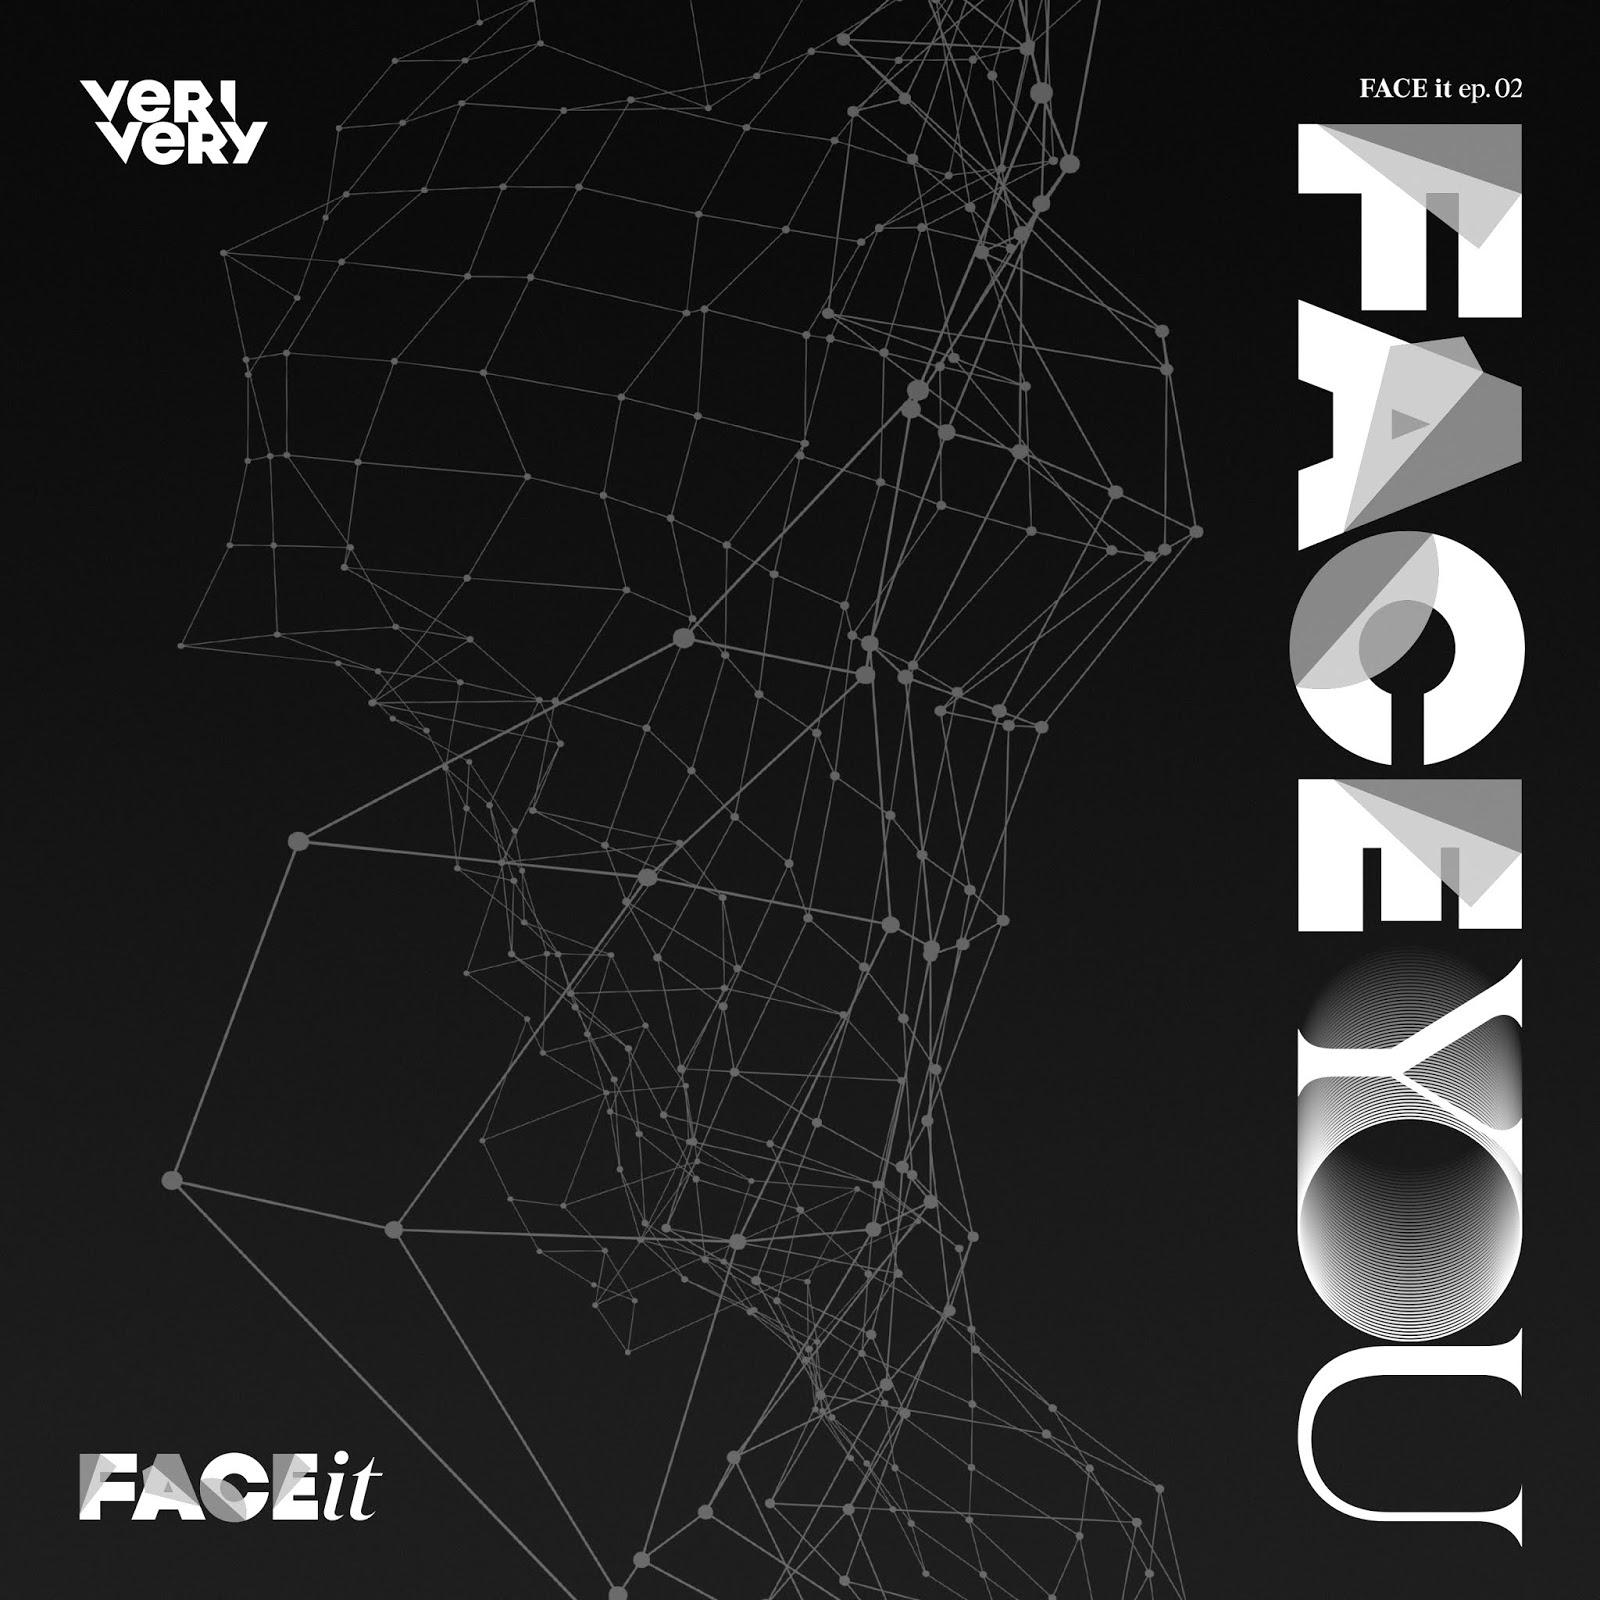 VERIVERY (베리베리) Face You